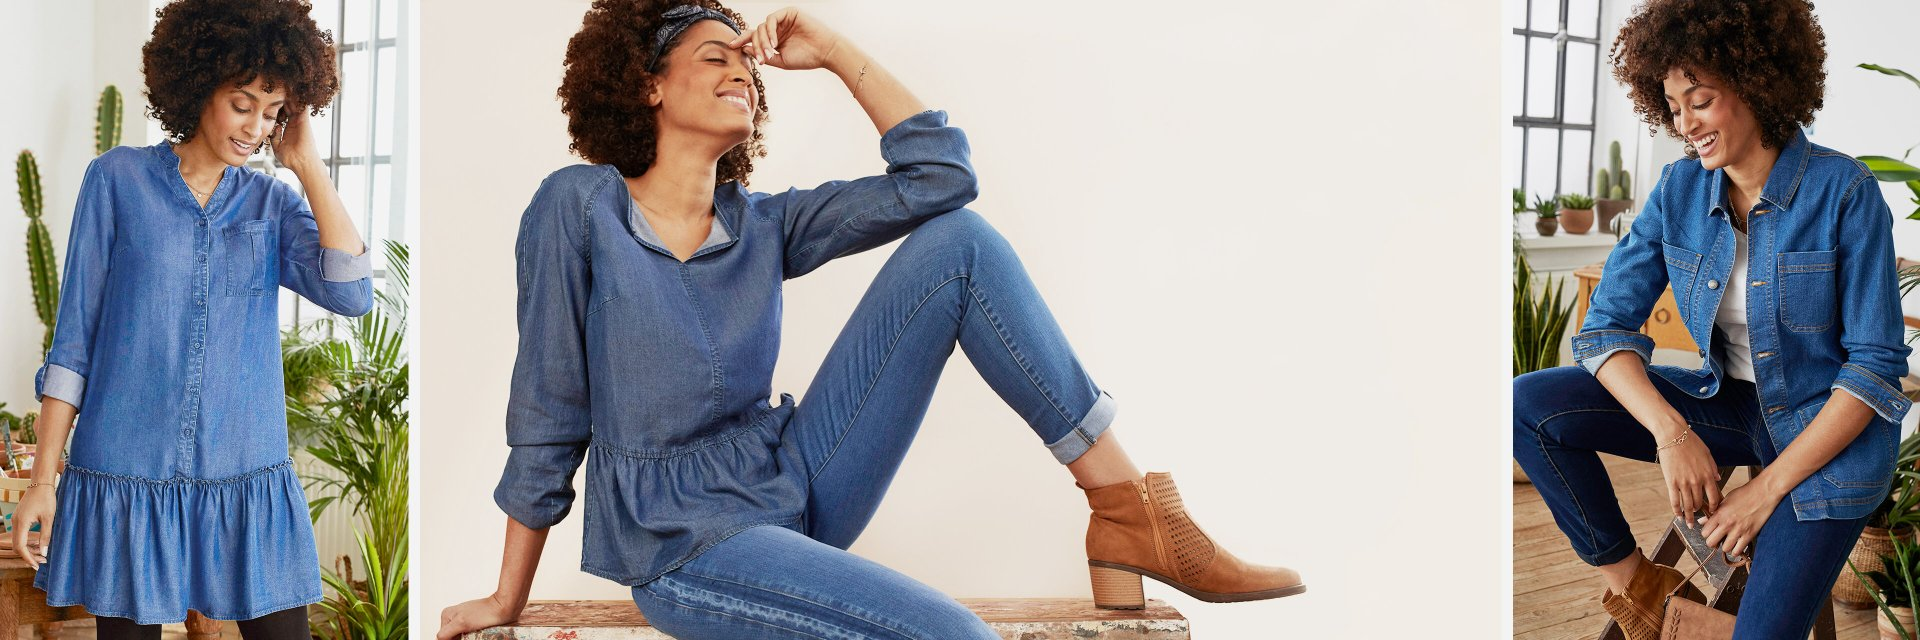 mode, schuhe & möbel online bestellen | bonprix